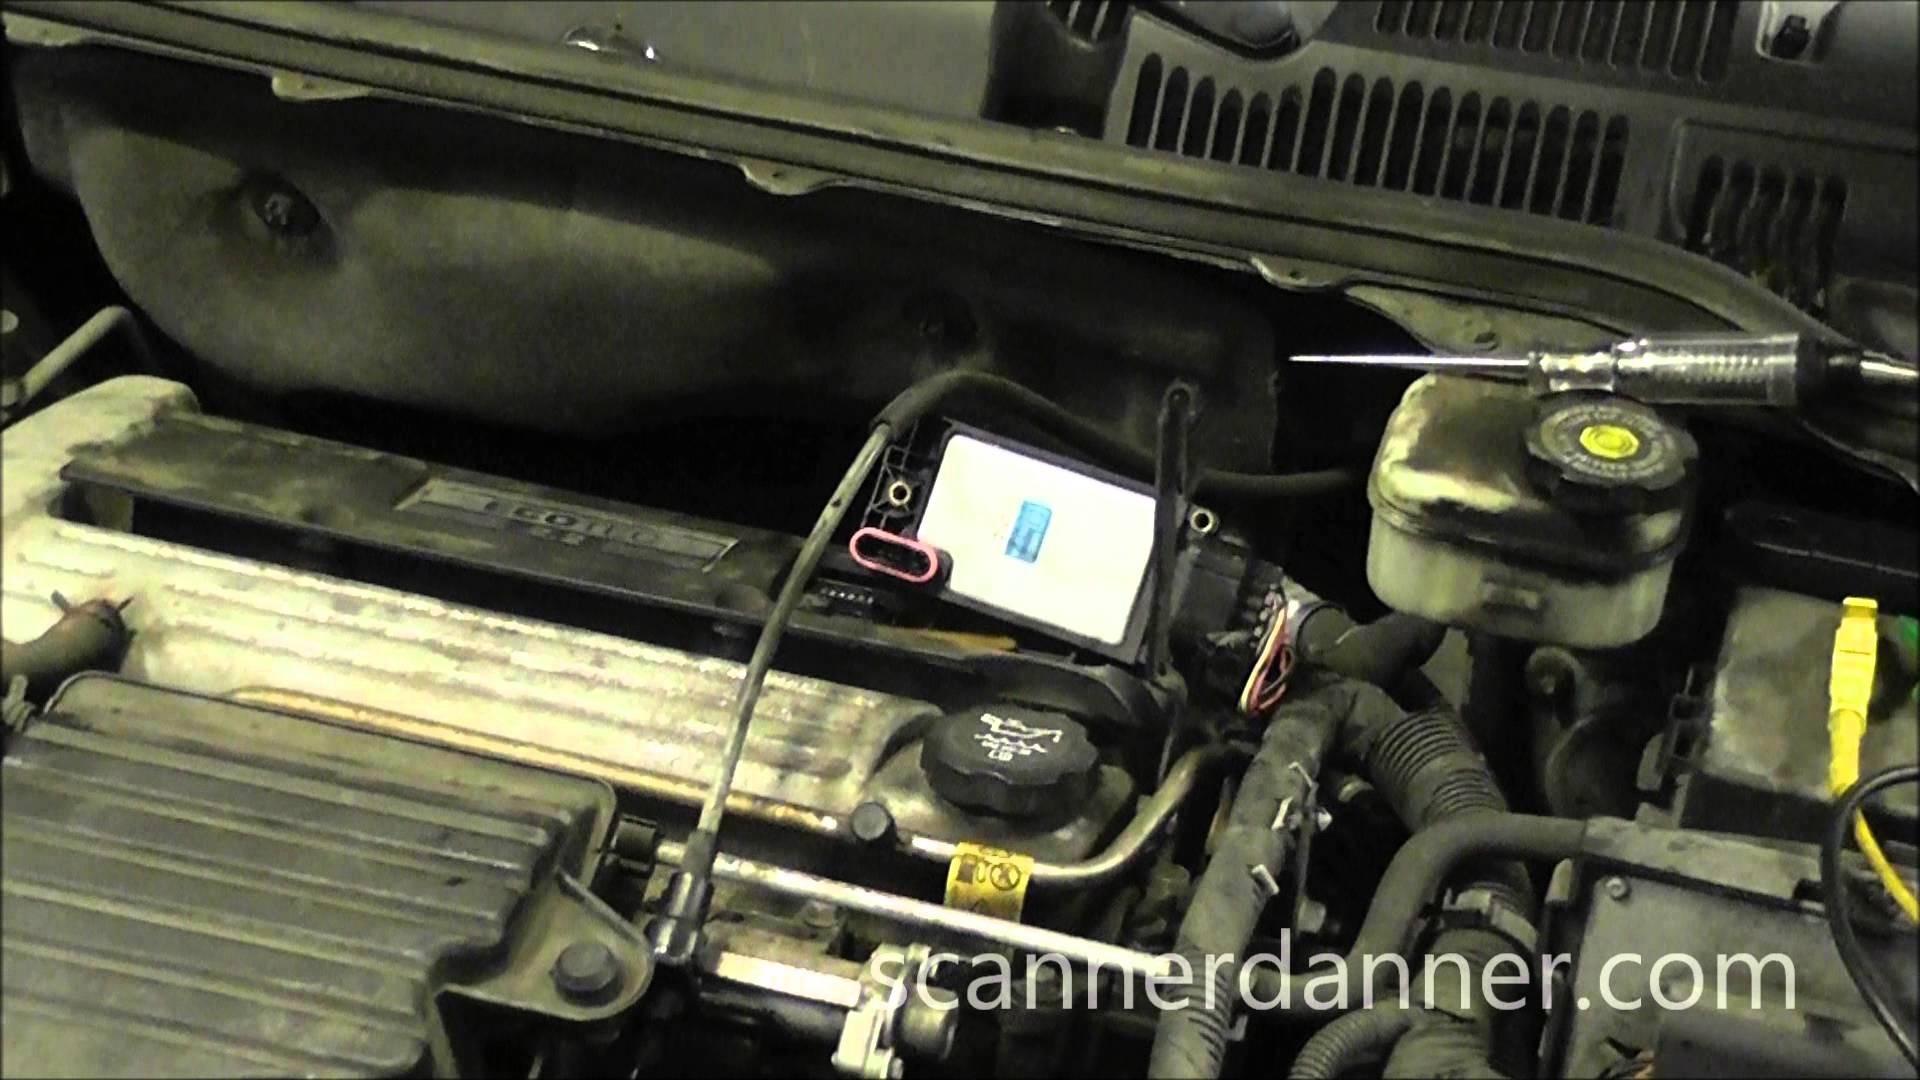 chevy 2 engine diagram kia sorento wiring ecotec 2005 cavalier e3ce229 2004 saturn ion misfire no spark from one coil